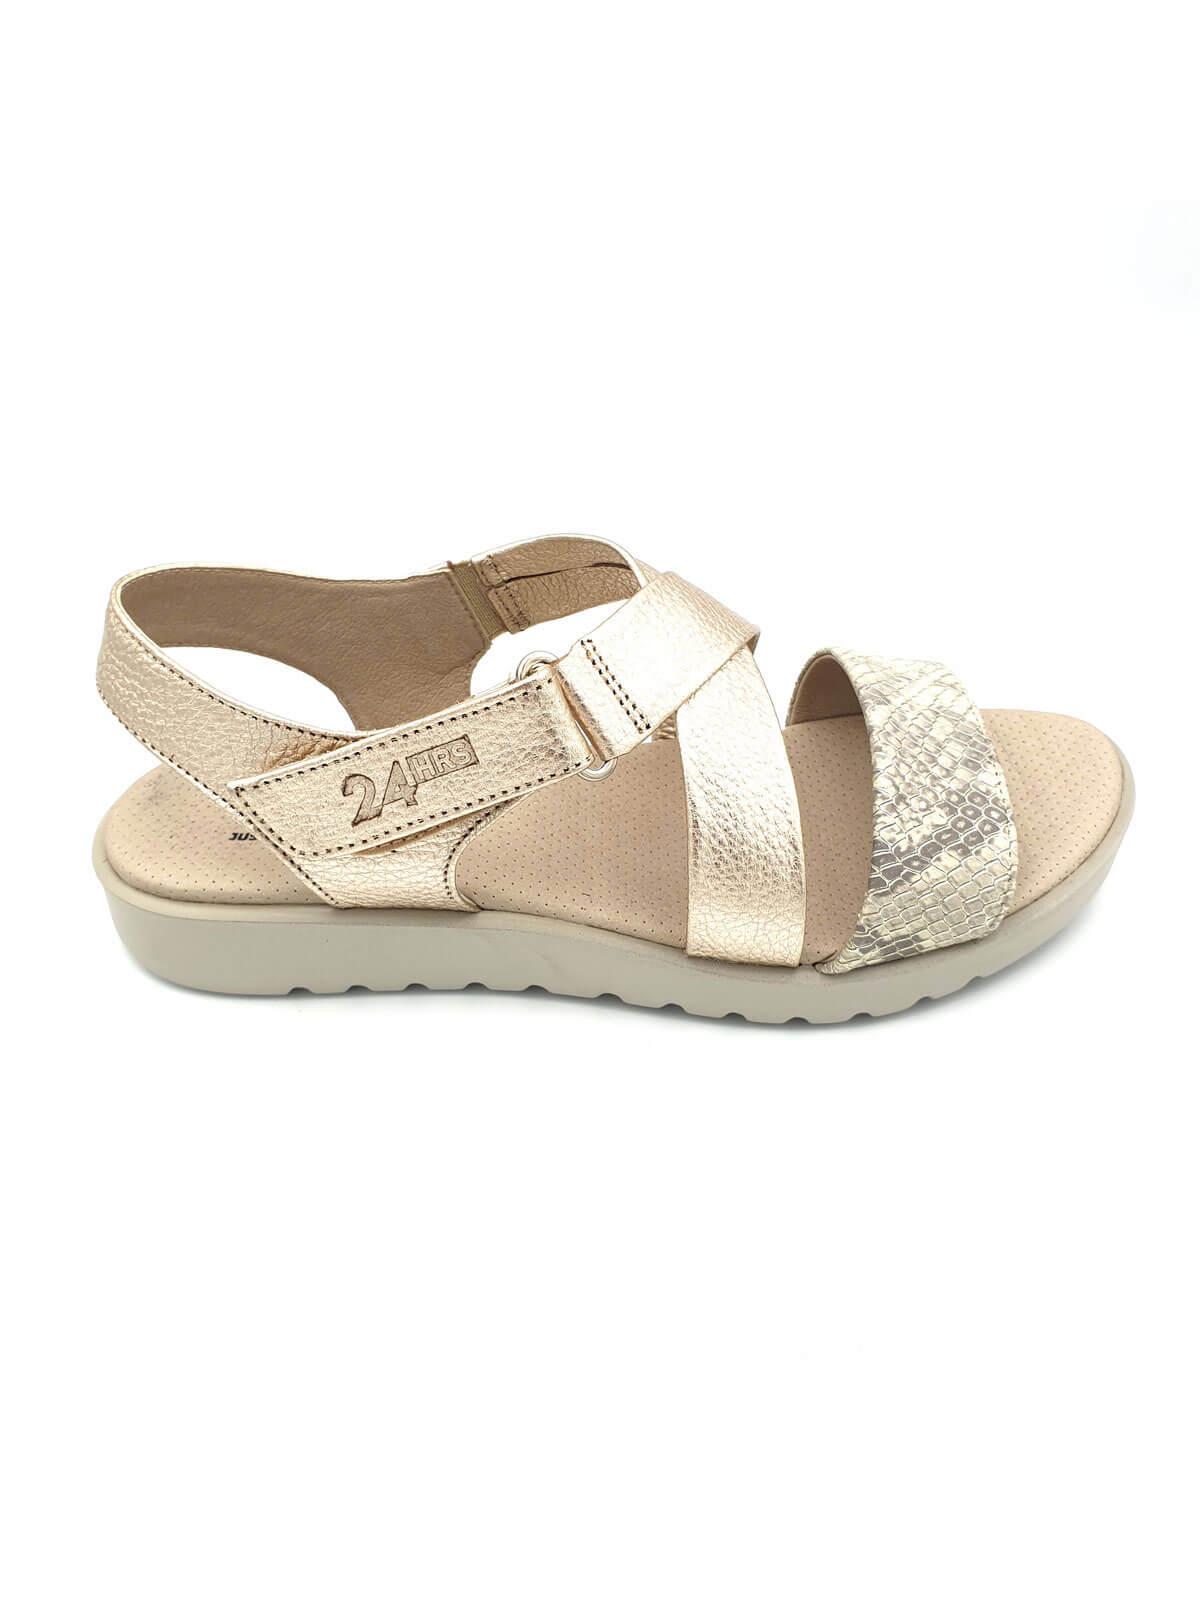 Doradas MujerBanes Zapatos 24hrs Sandalias Moda Planas De kPXZTwiOu